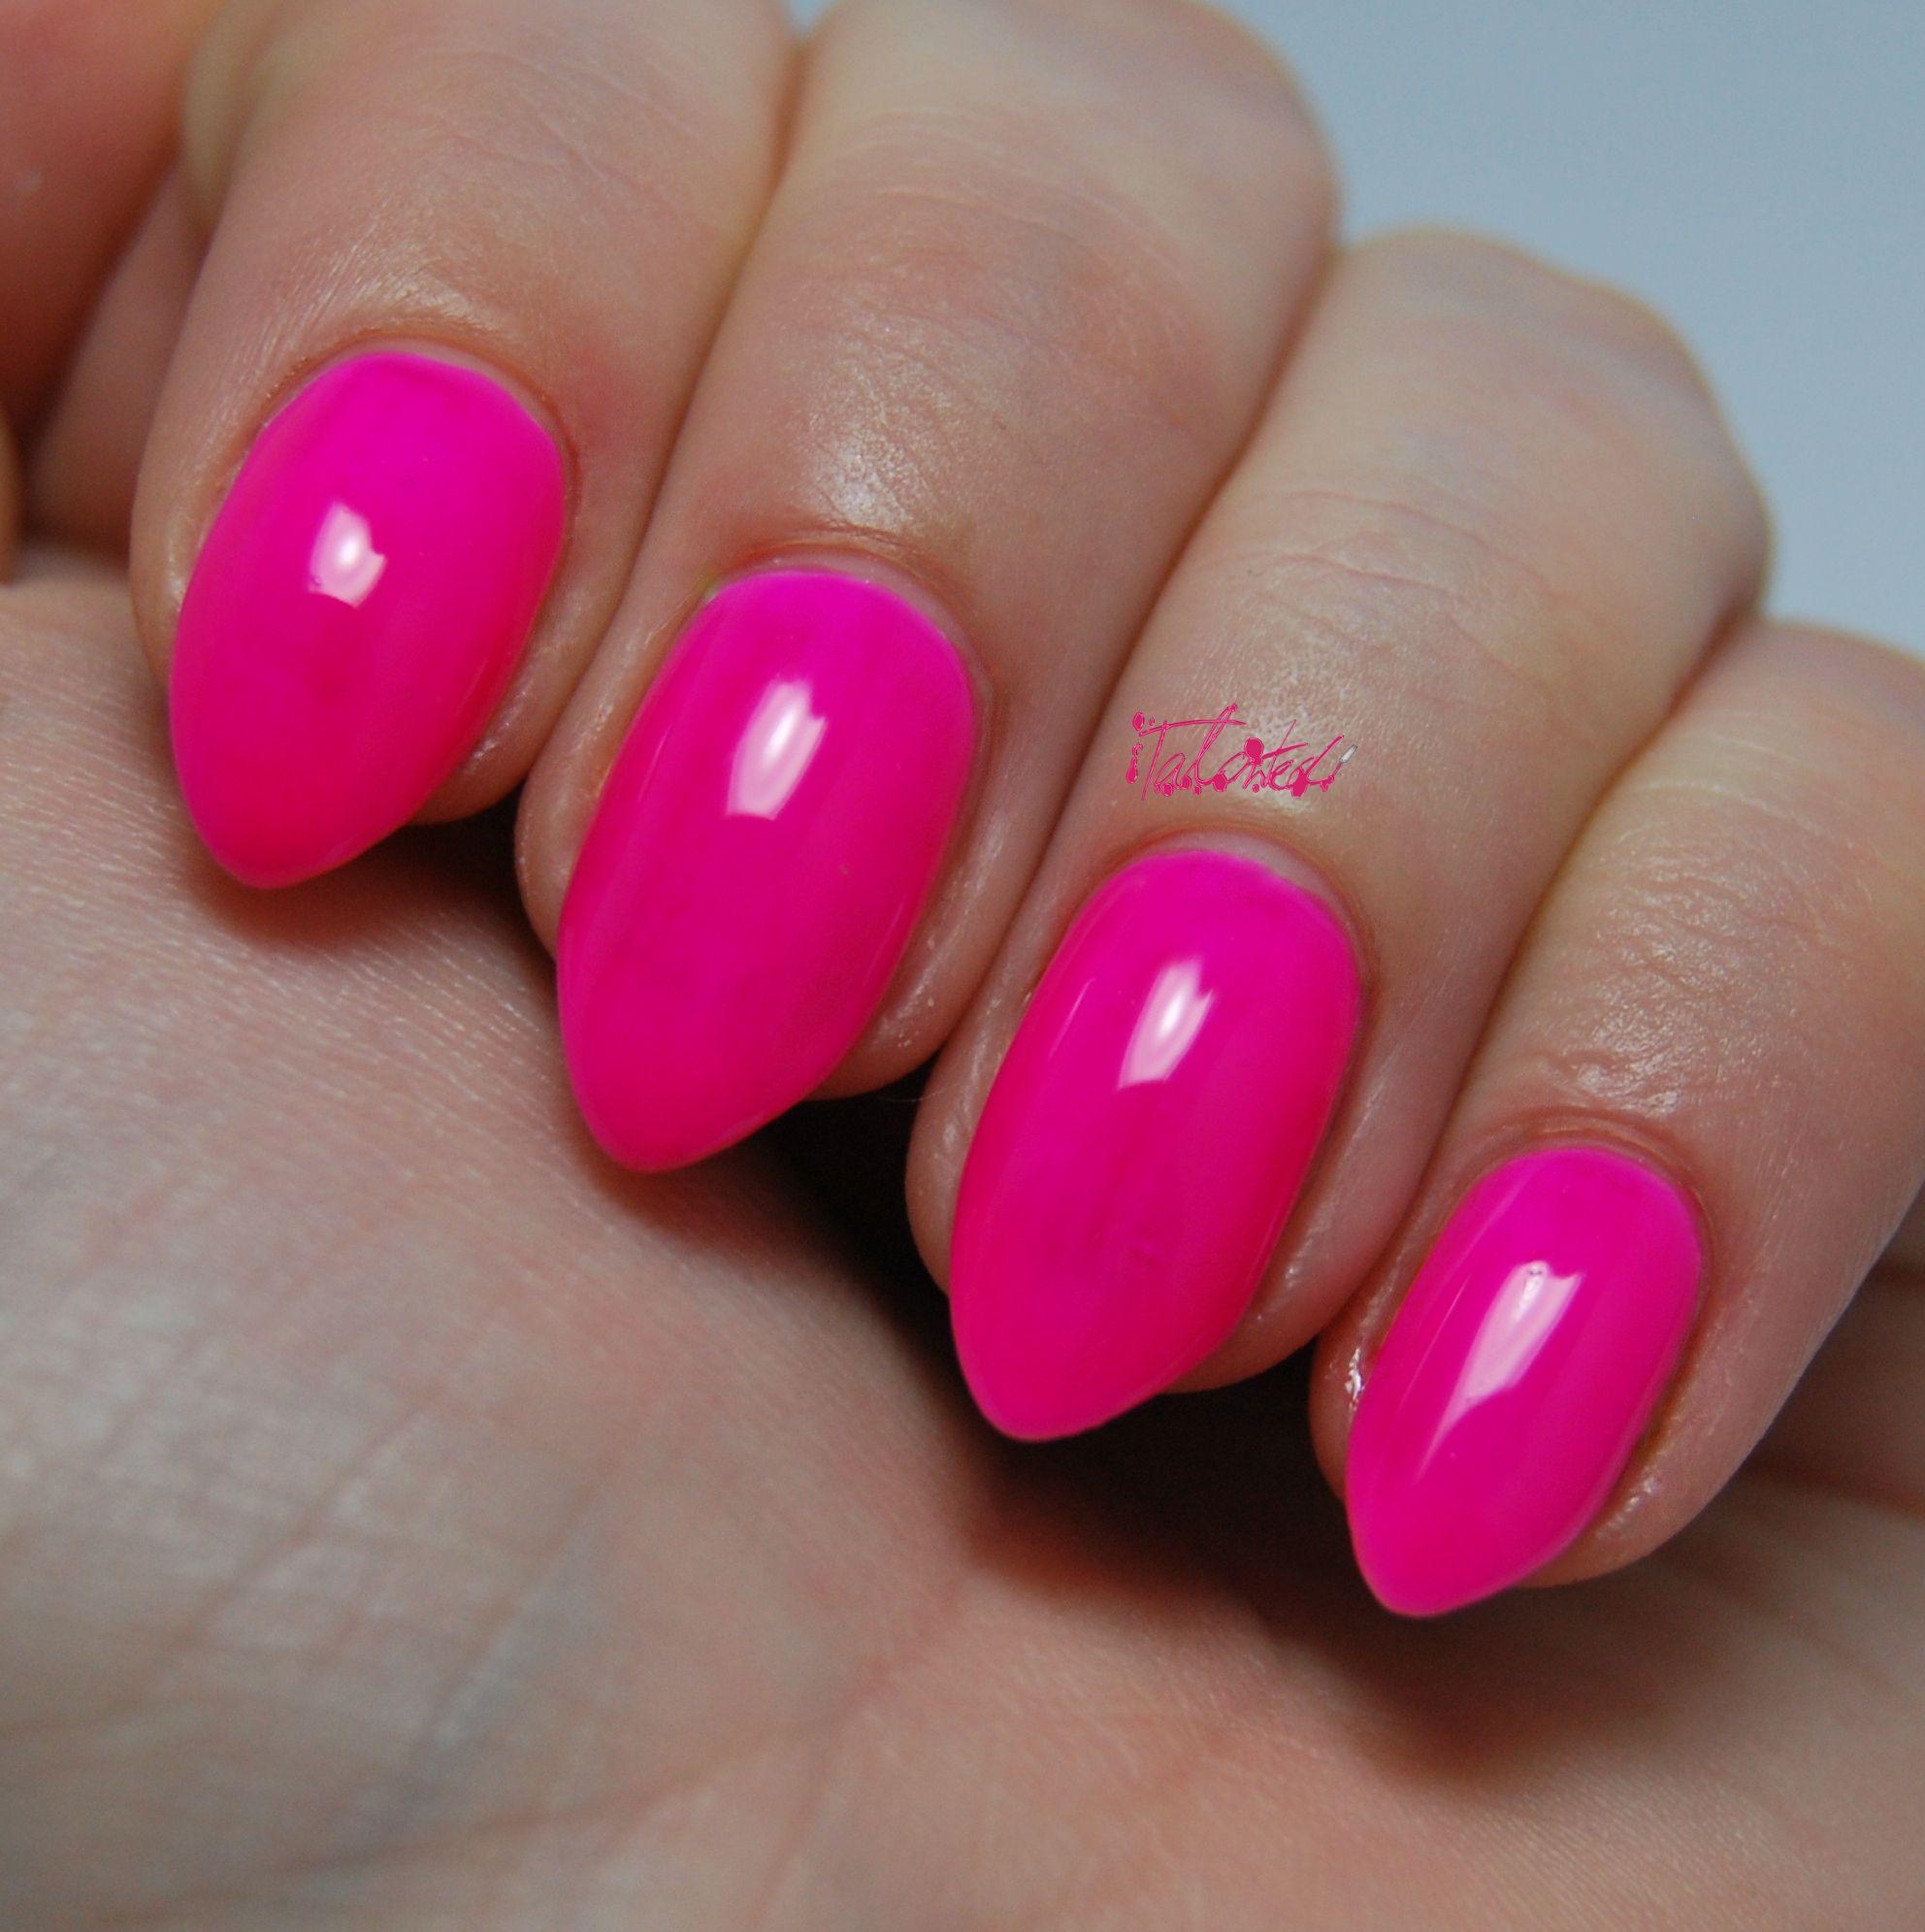 Pacific Rapsodi 12 Nail Varnish   Neon pink nails, Varnishes and ...